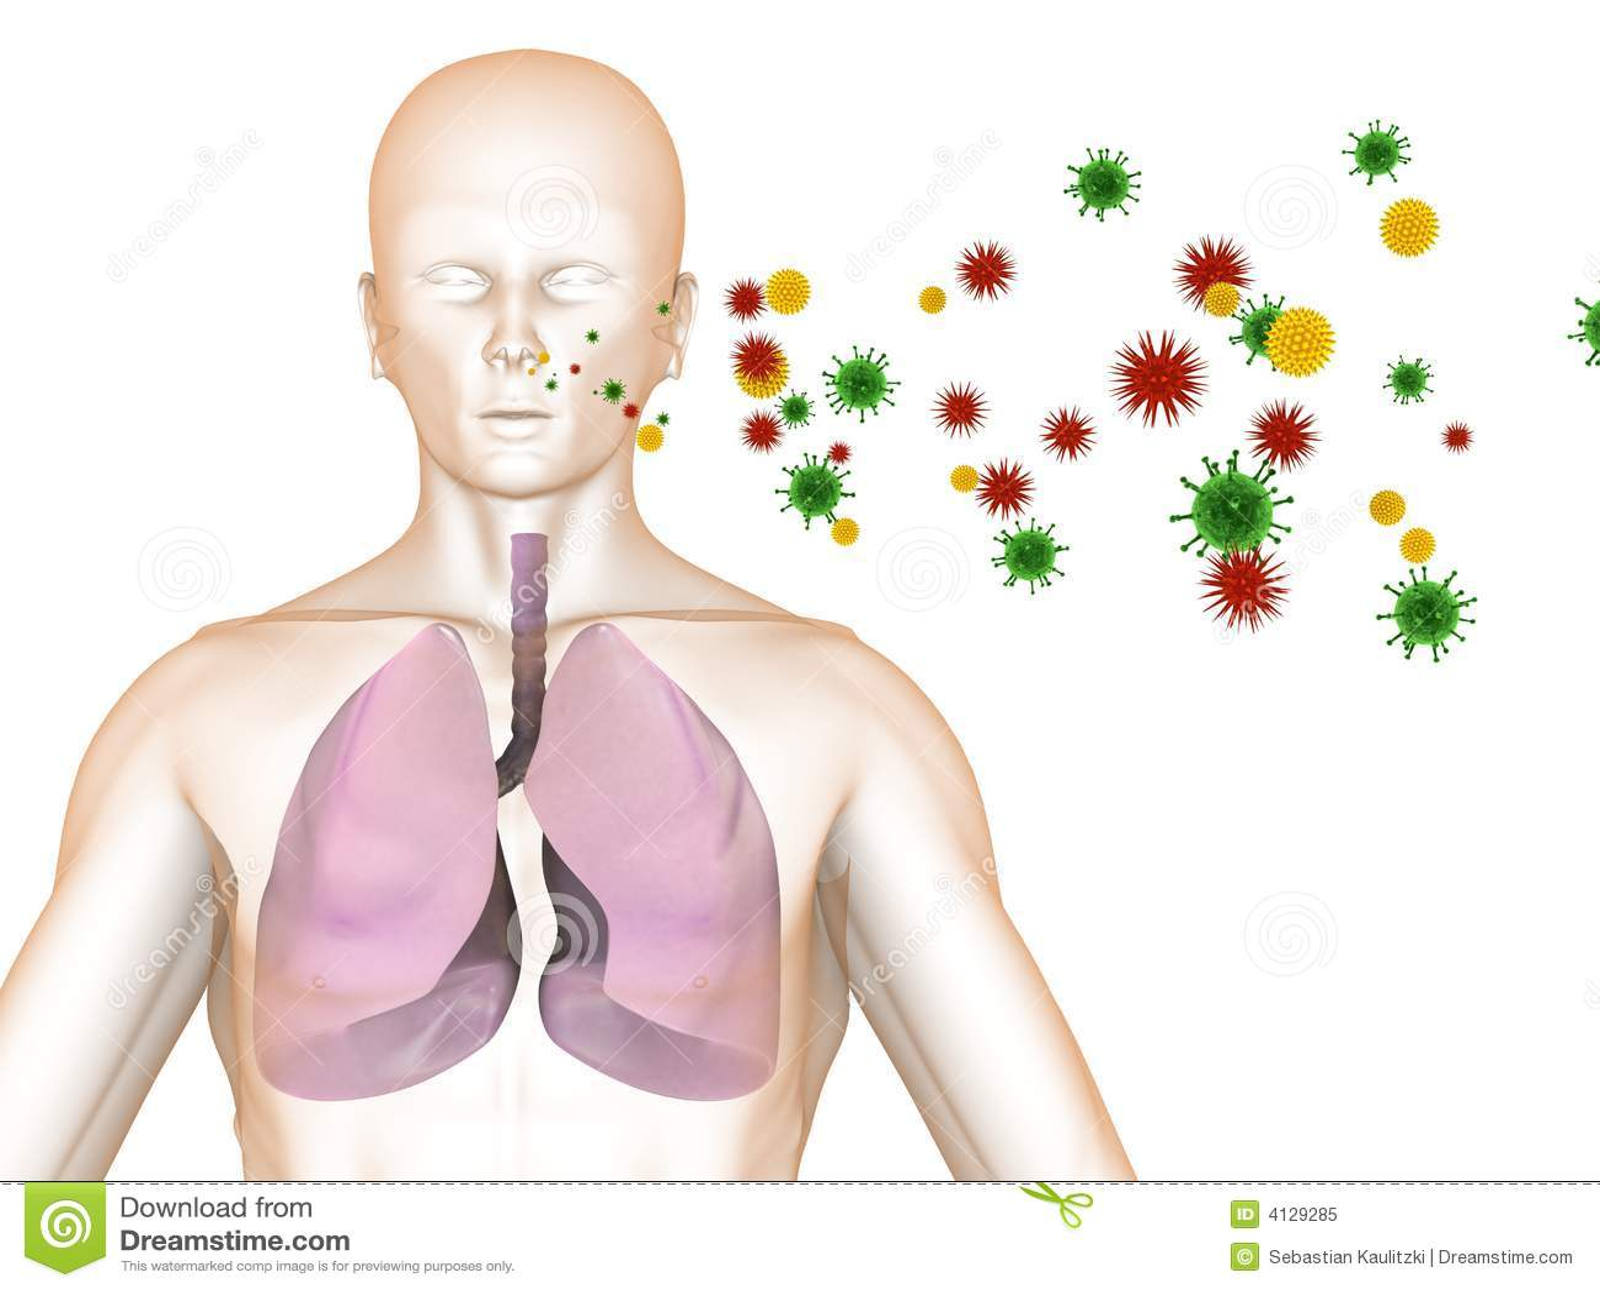 Формы туберкулеза схема